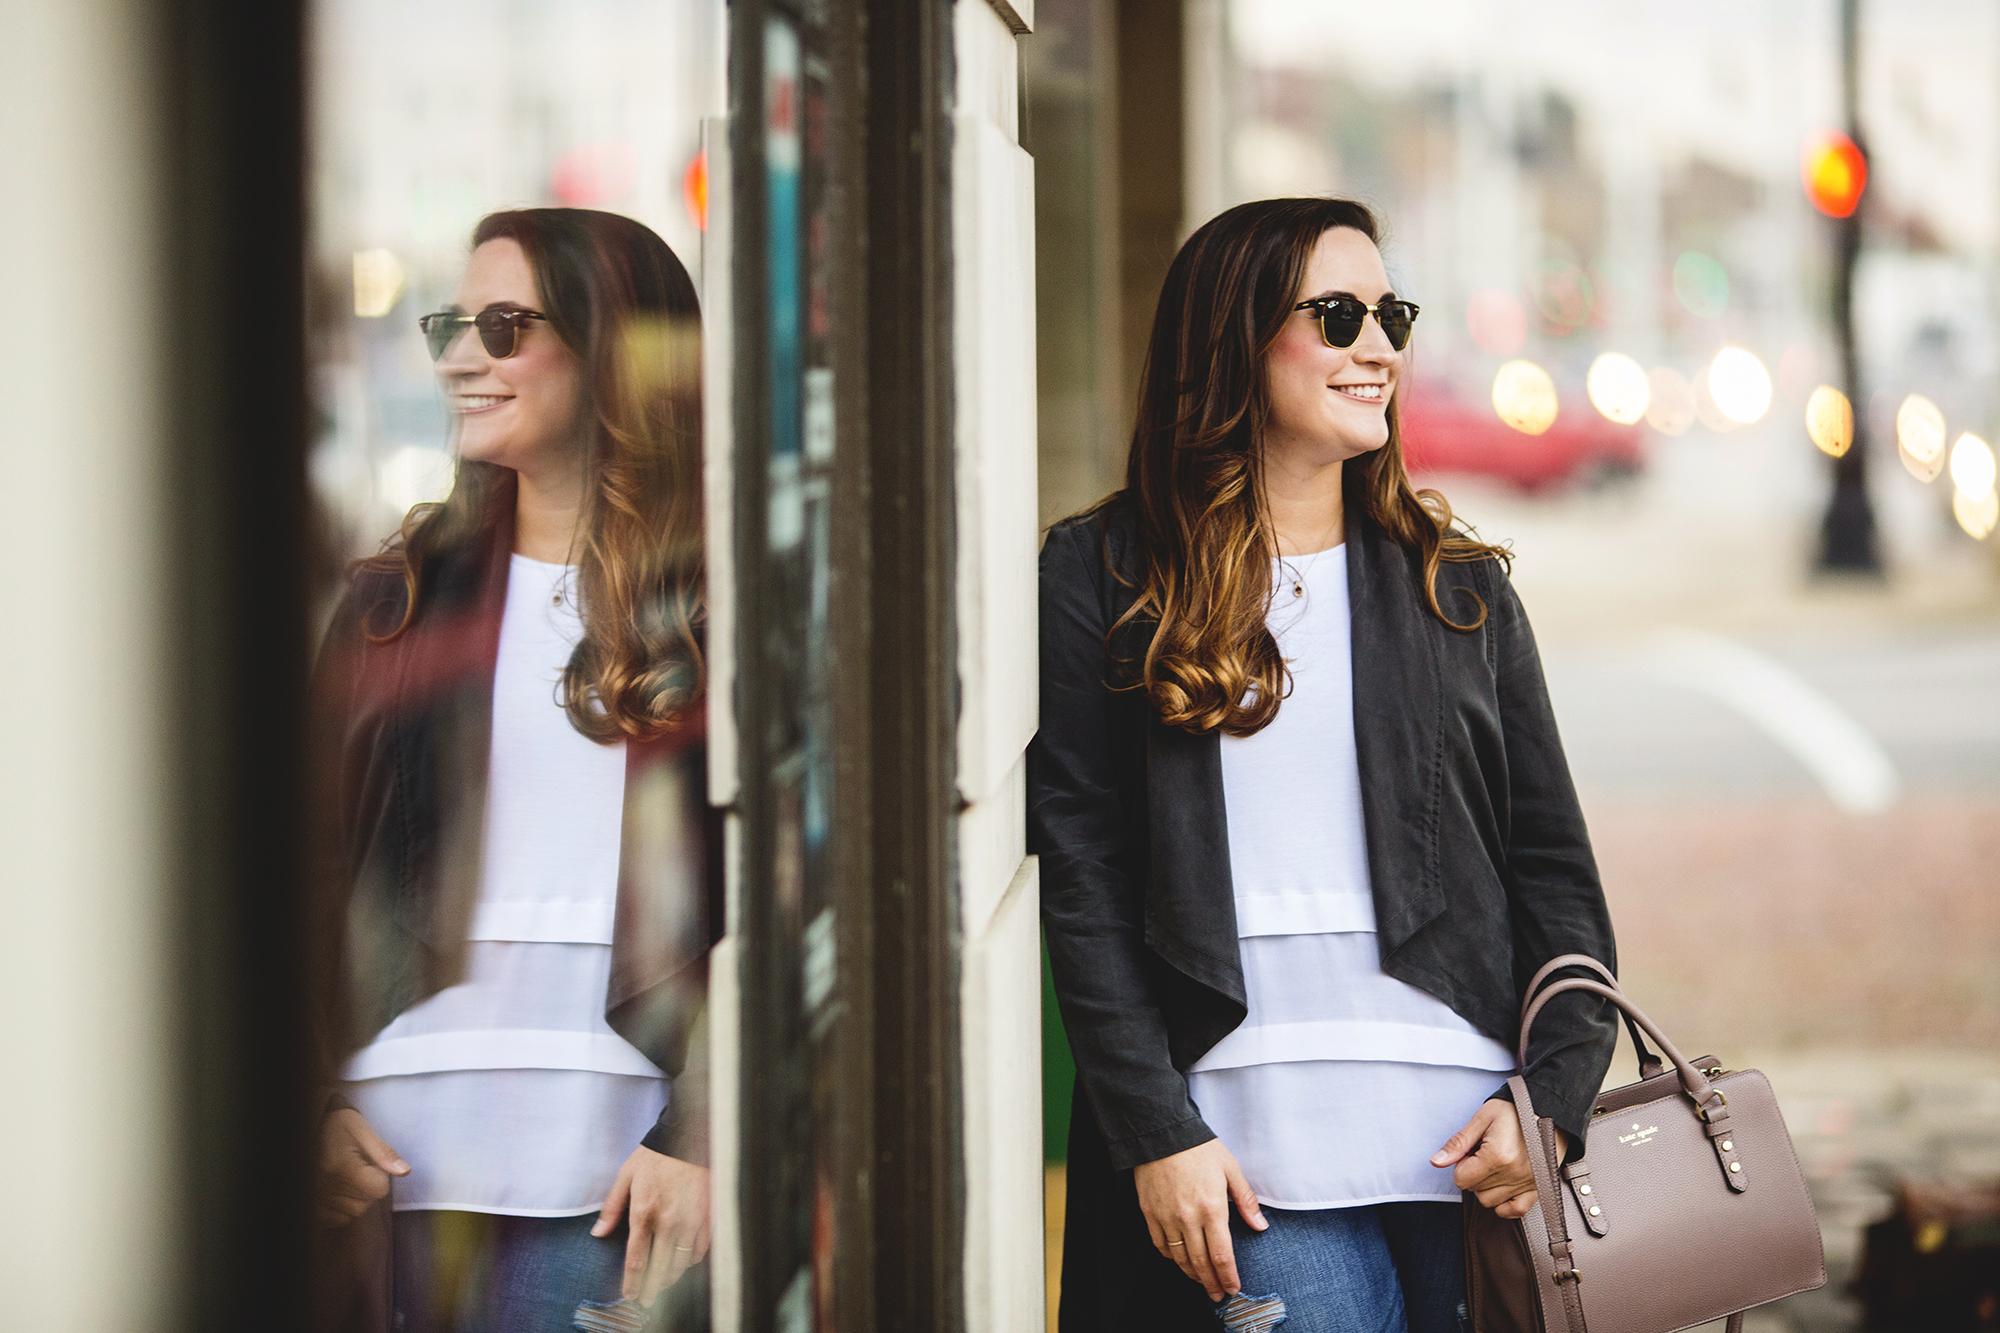 Seriously_Sabrina_Photography_Ashland_Kentucky_Fashion_Blogger_Portraits_LaurenFannin10.jpg